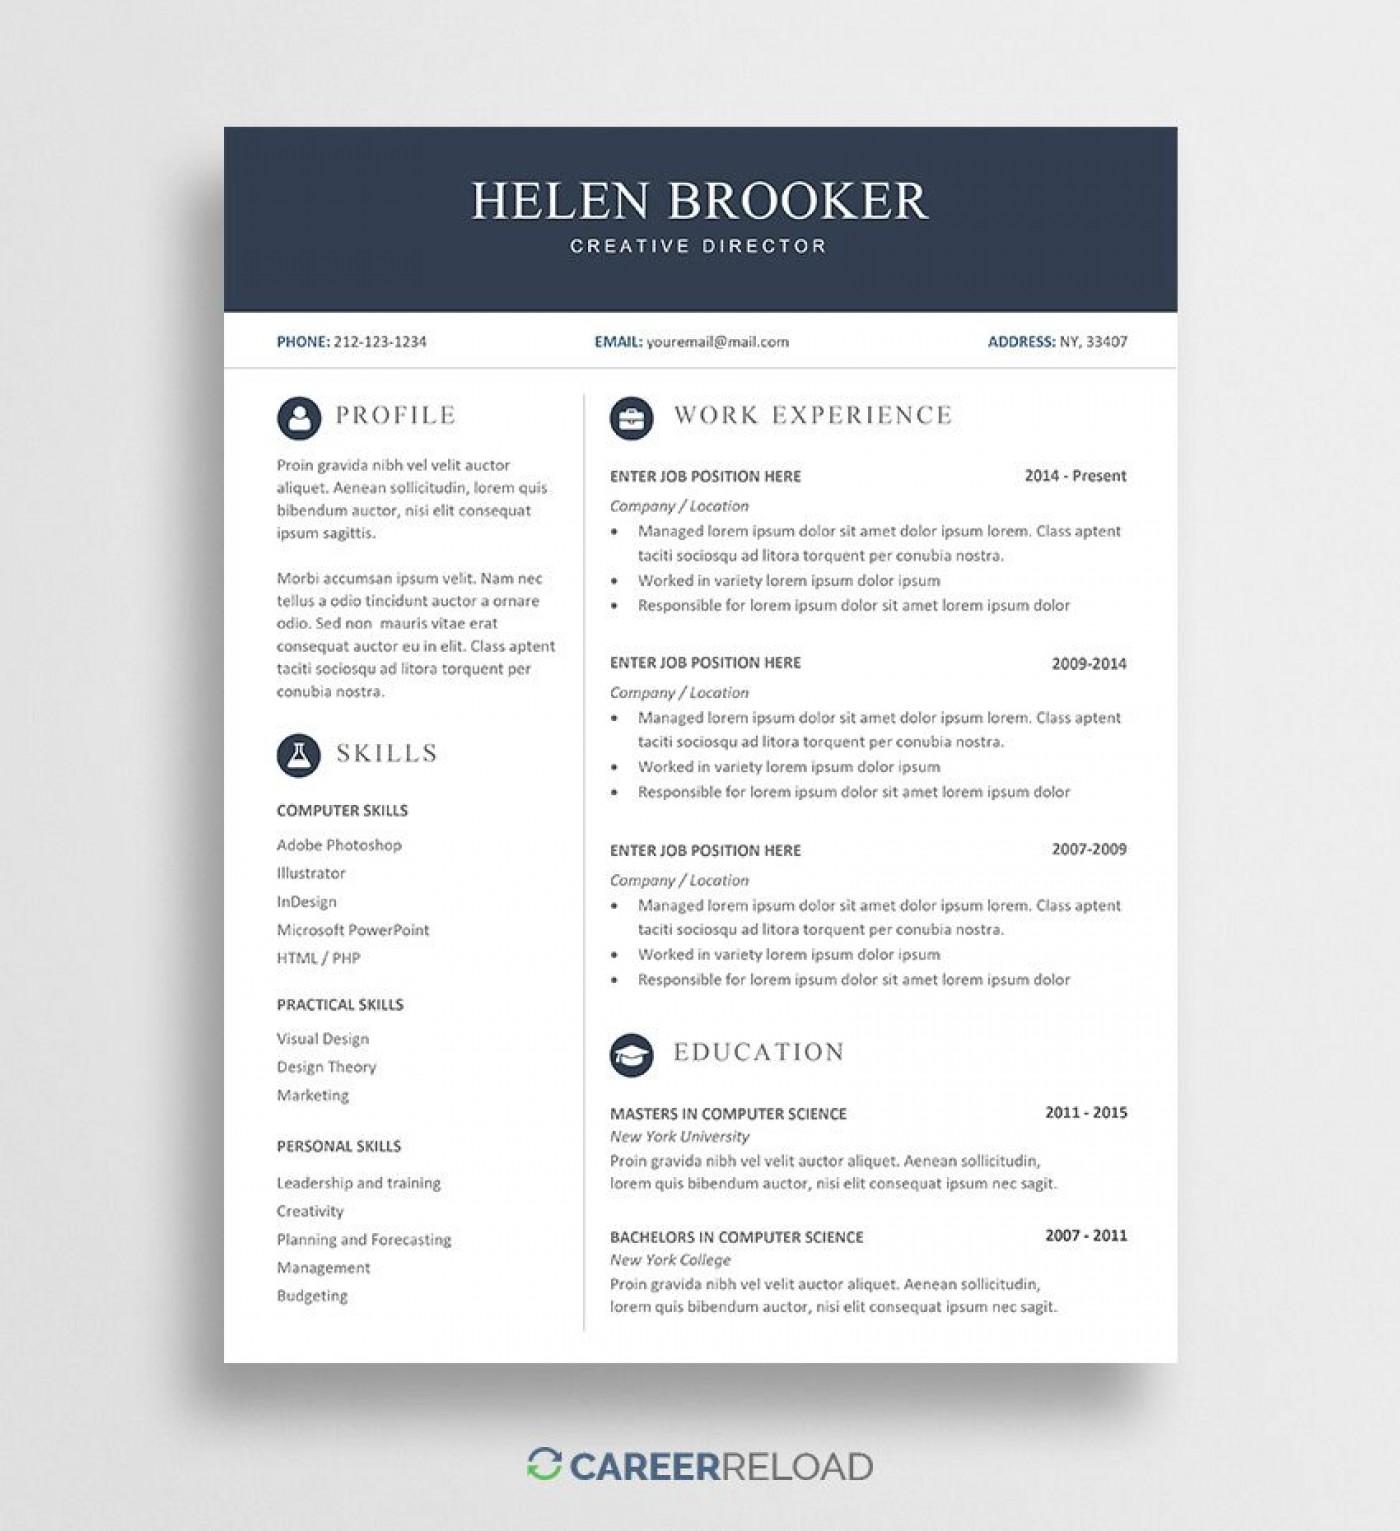 003 Fantastic Resume Template Word Free Sample  Download 2020 Doc1400